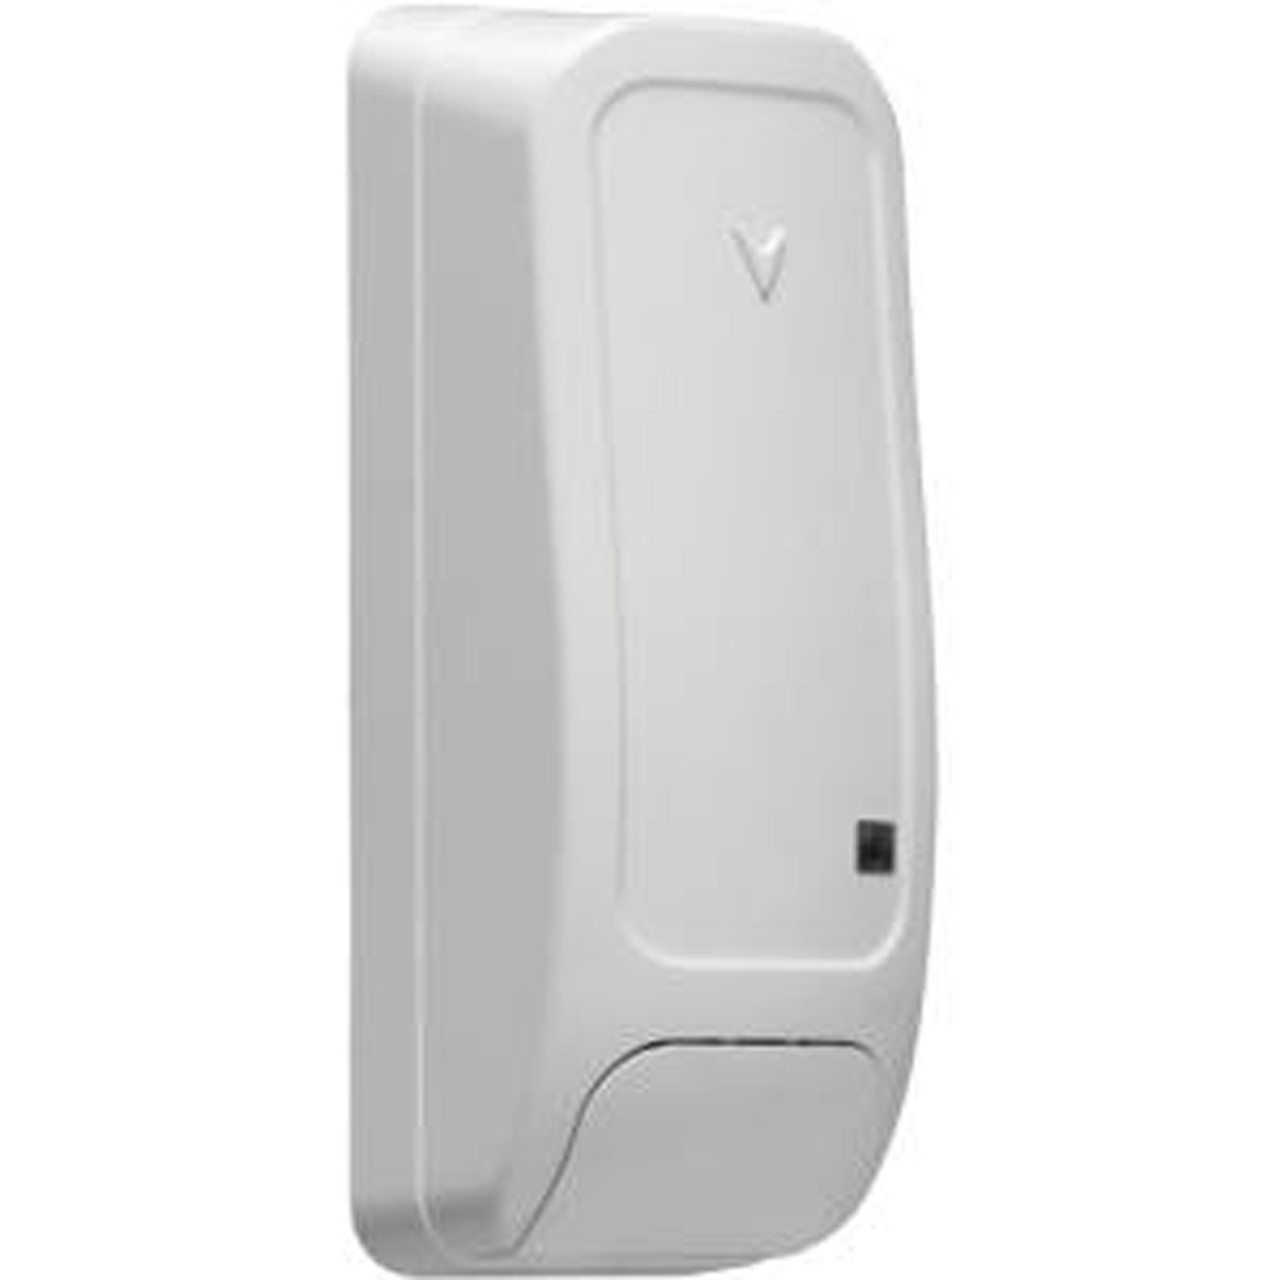 DSC//Tyco PG9935 Wireless PowerG Security Shock Detector